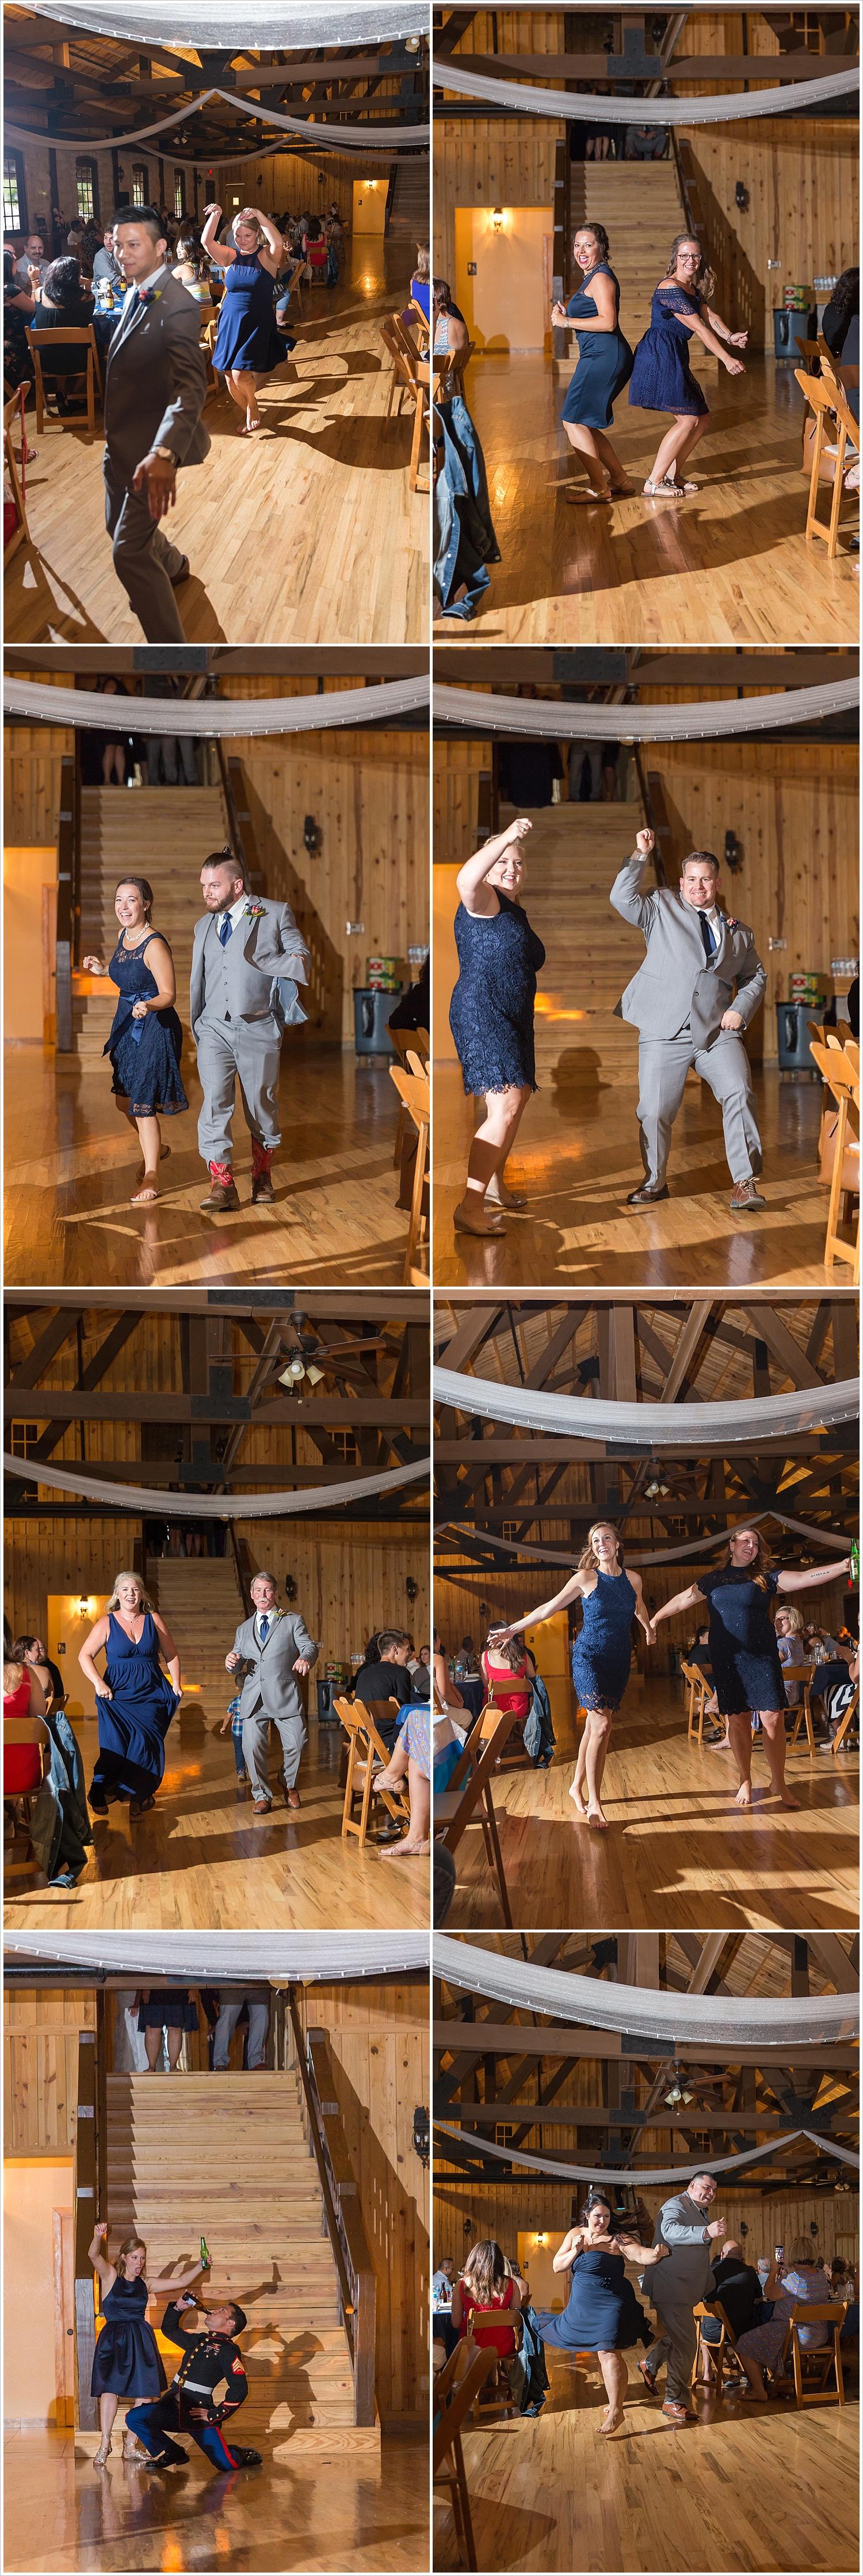 Bridal party grand entrance at reception, summer blush and navy wedding at Stone Hall at The Springs in McKinney, Texas, Jason & Melaina Photography, www.jasonandmelaina.com